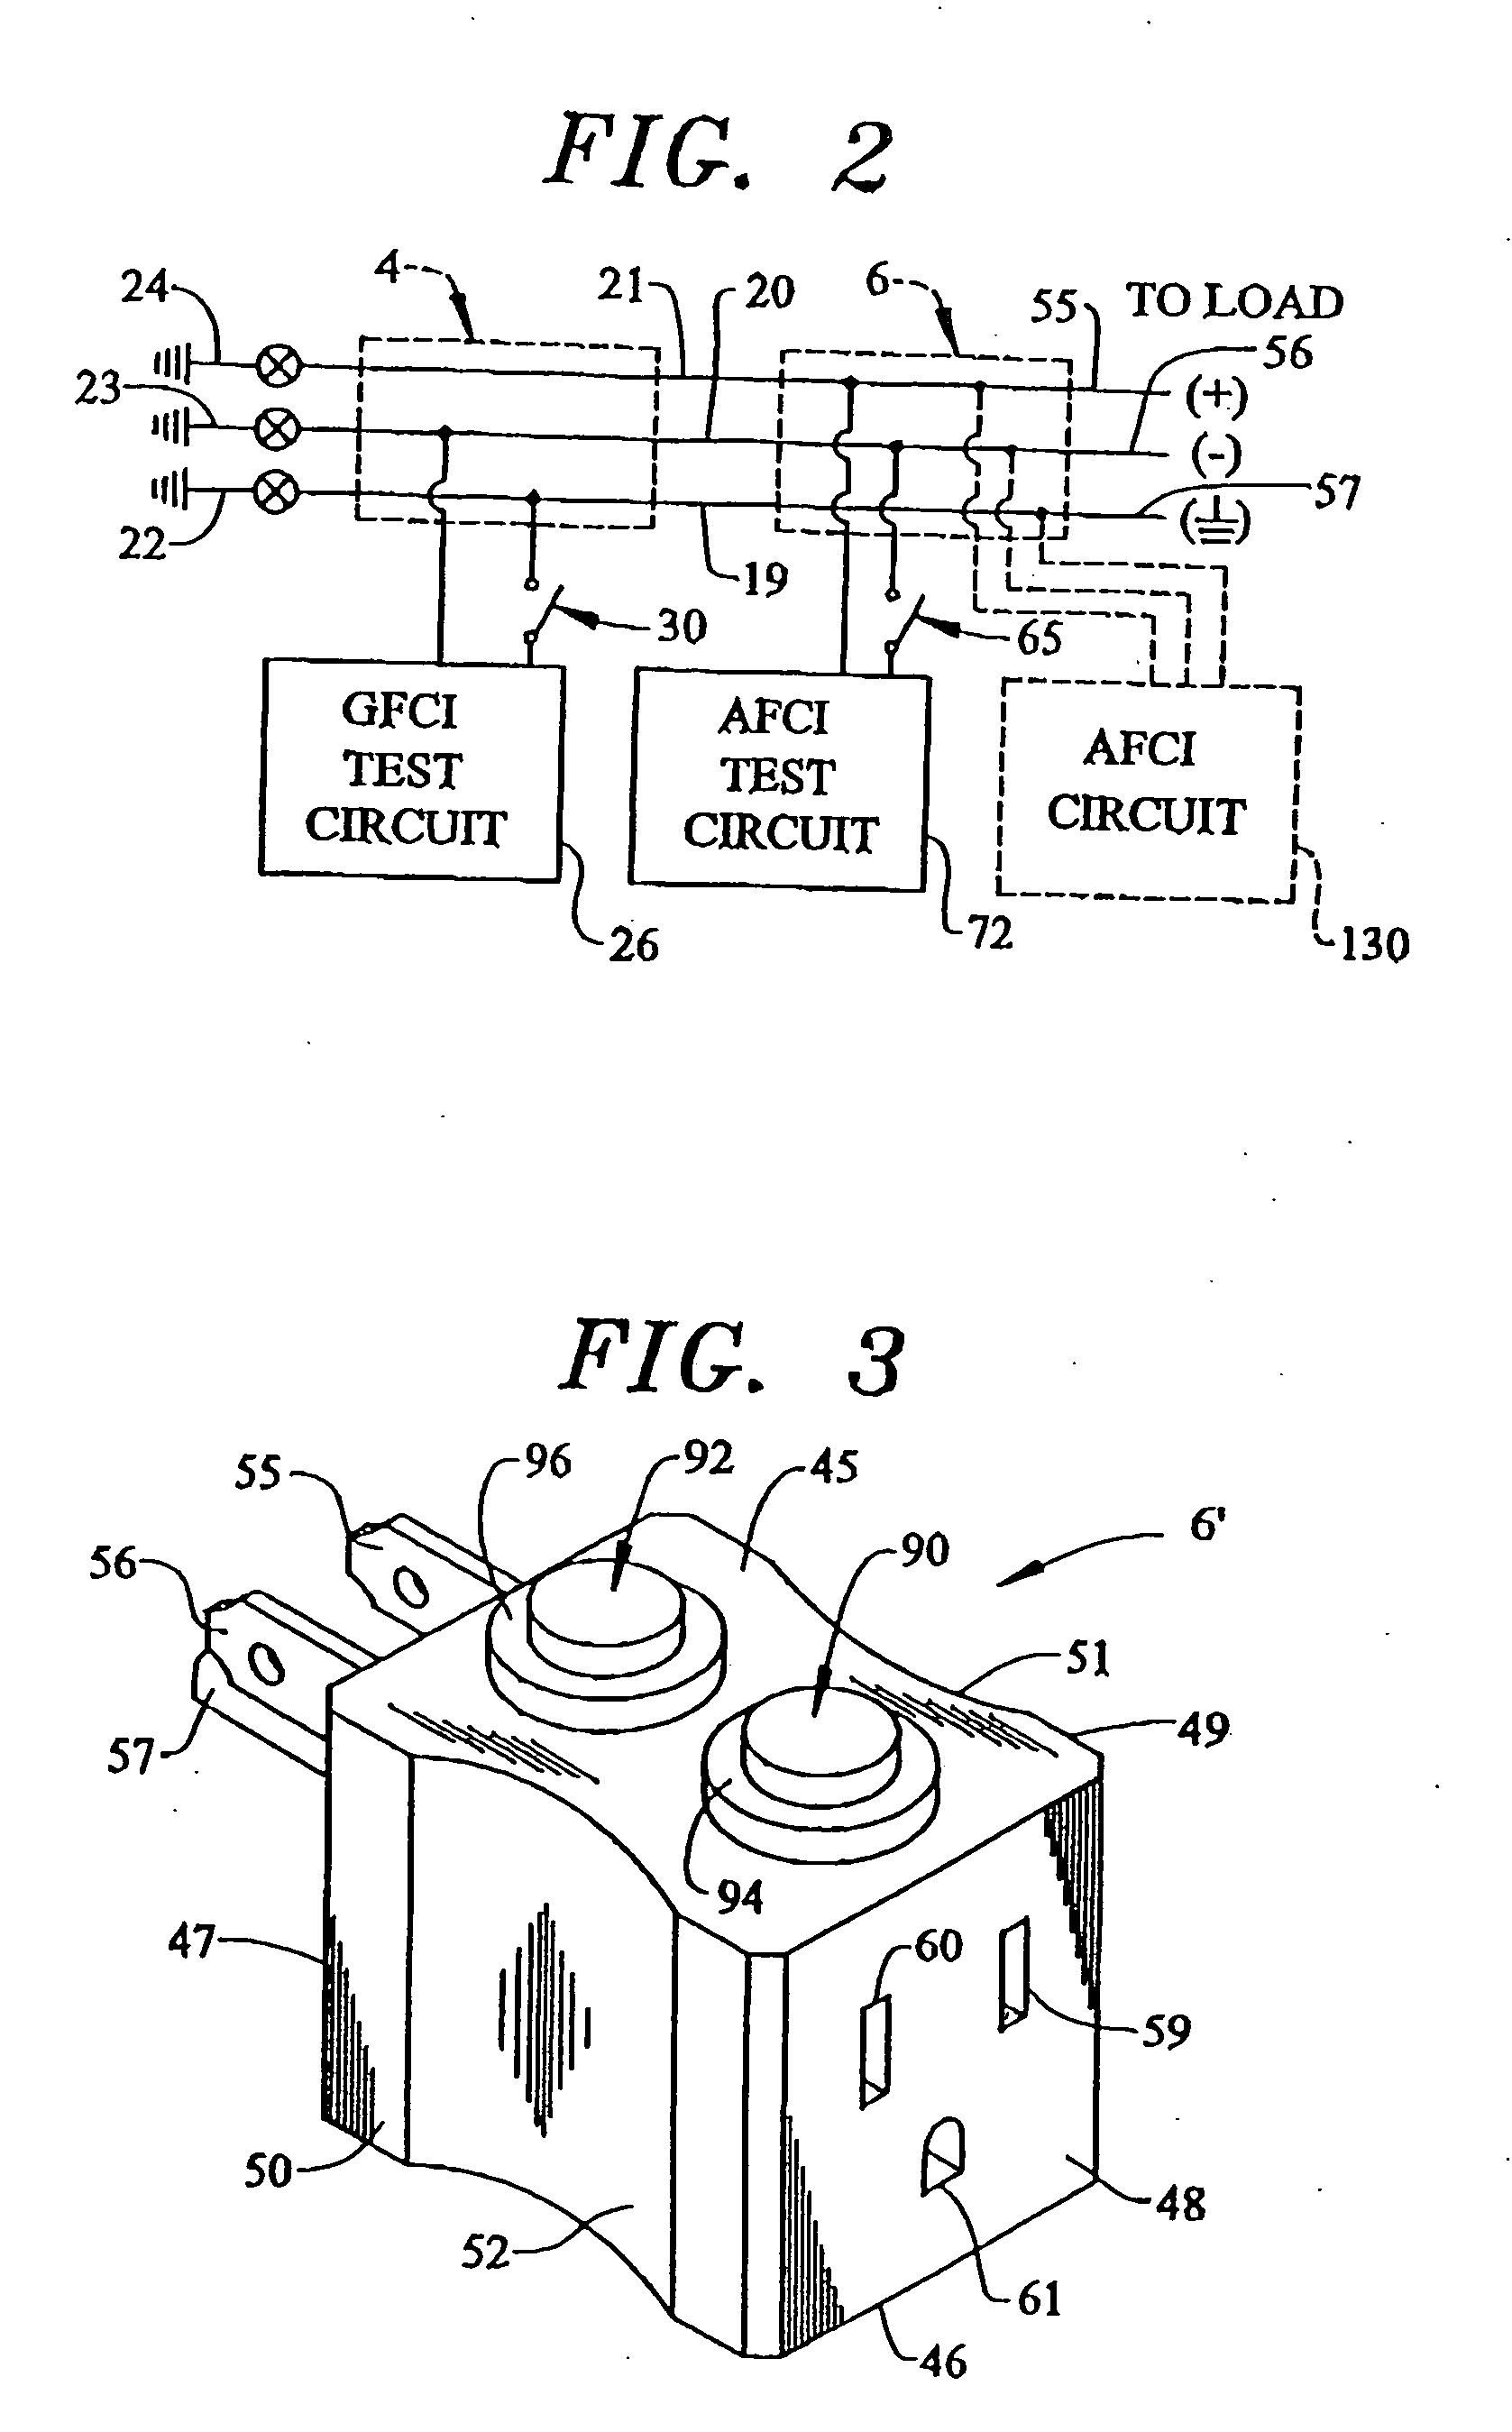 patent us20060103390 - afci circuit test module